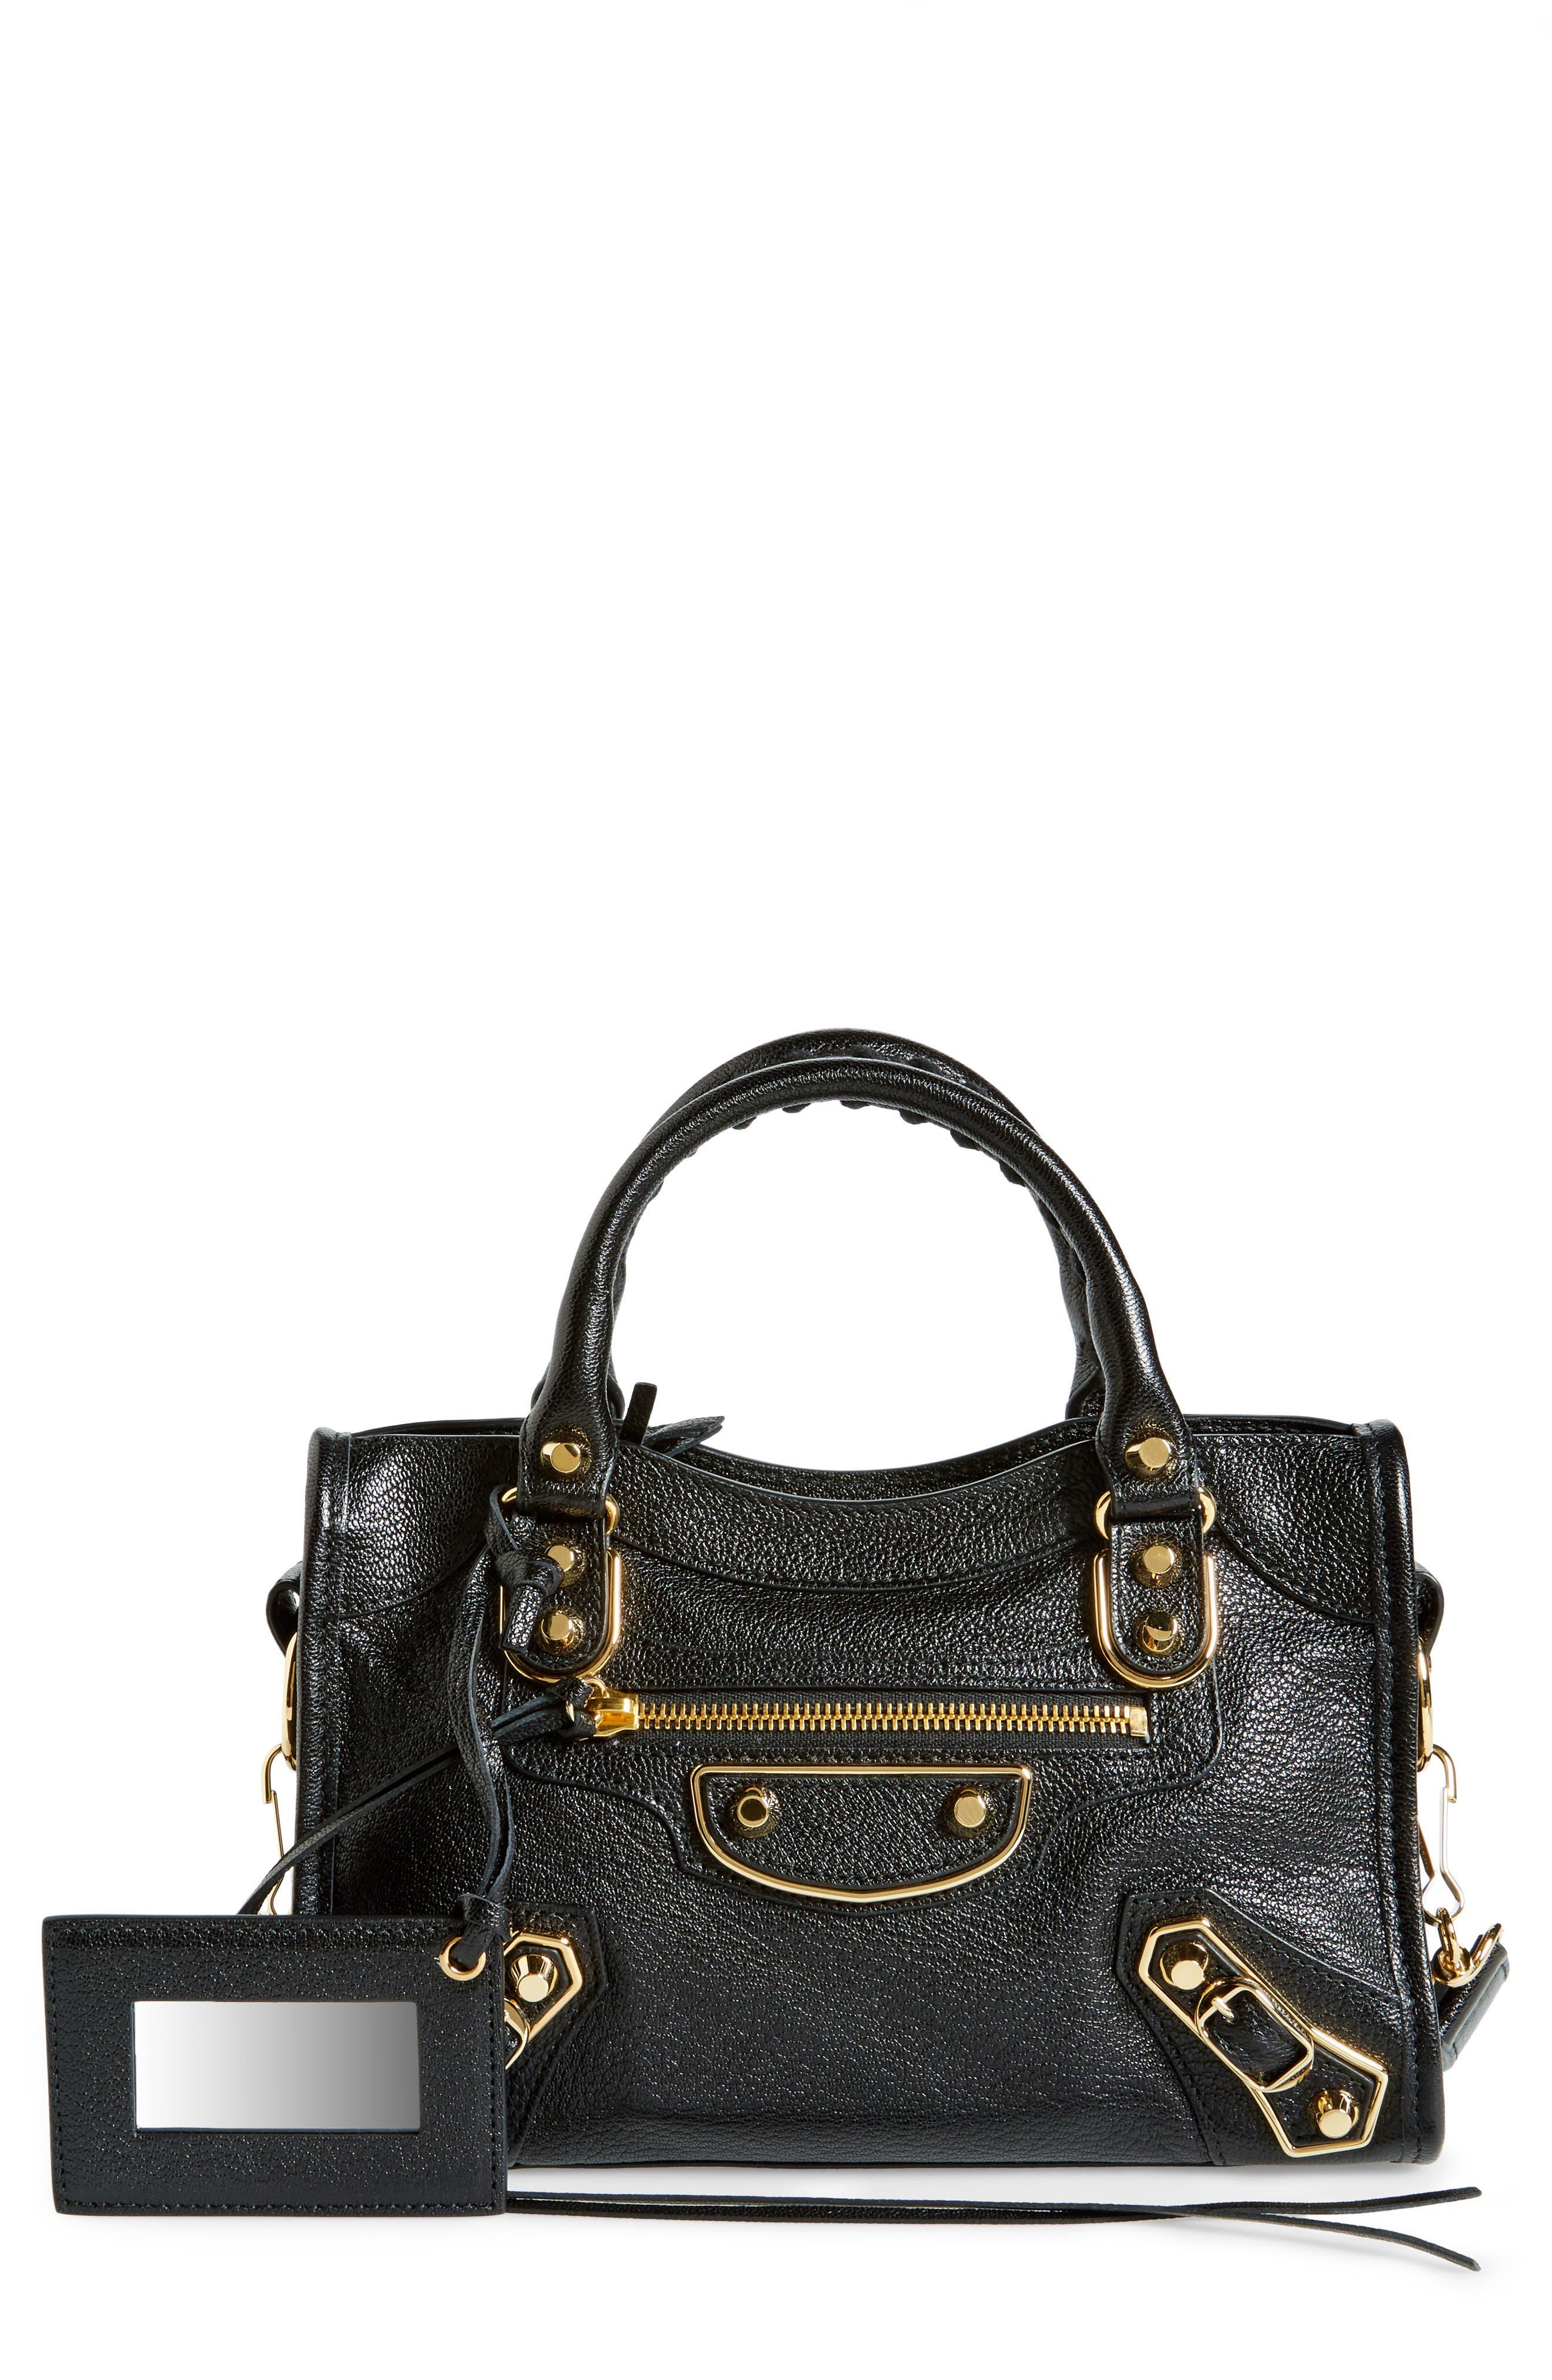 Metallic Edge Mini City Bag,                         Main,                         color, 1000 NOIR